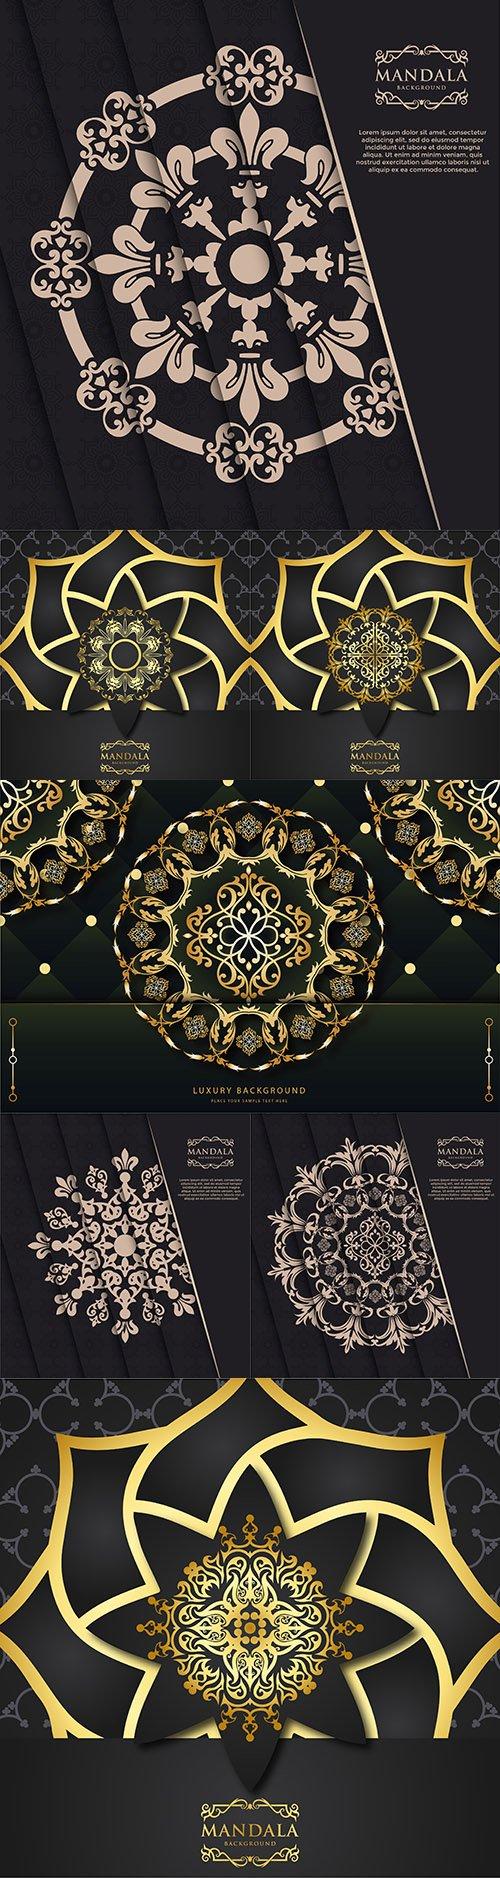 Luxury mandala decorative ornament design gold